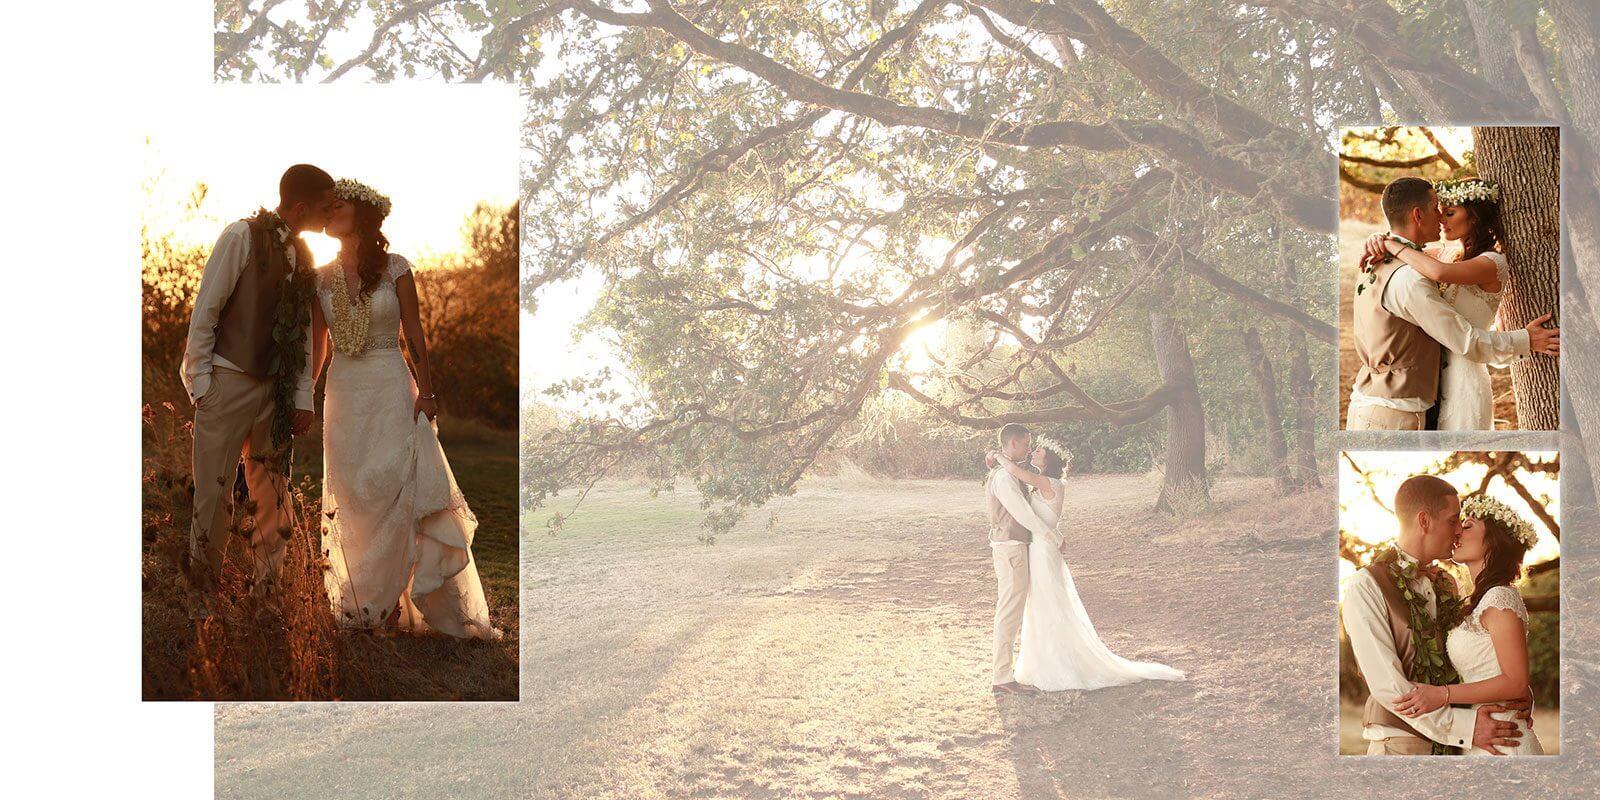 Jasper-House-Farm-Outdoor-Wedding-Lane-County-Oregon-photographers-064-065.jpg